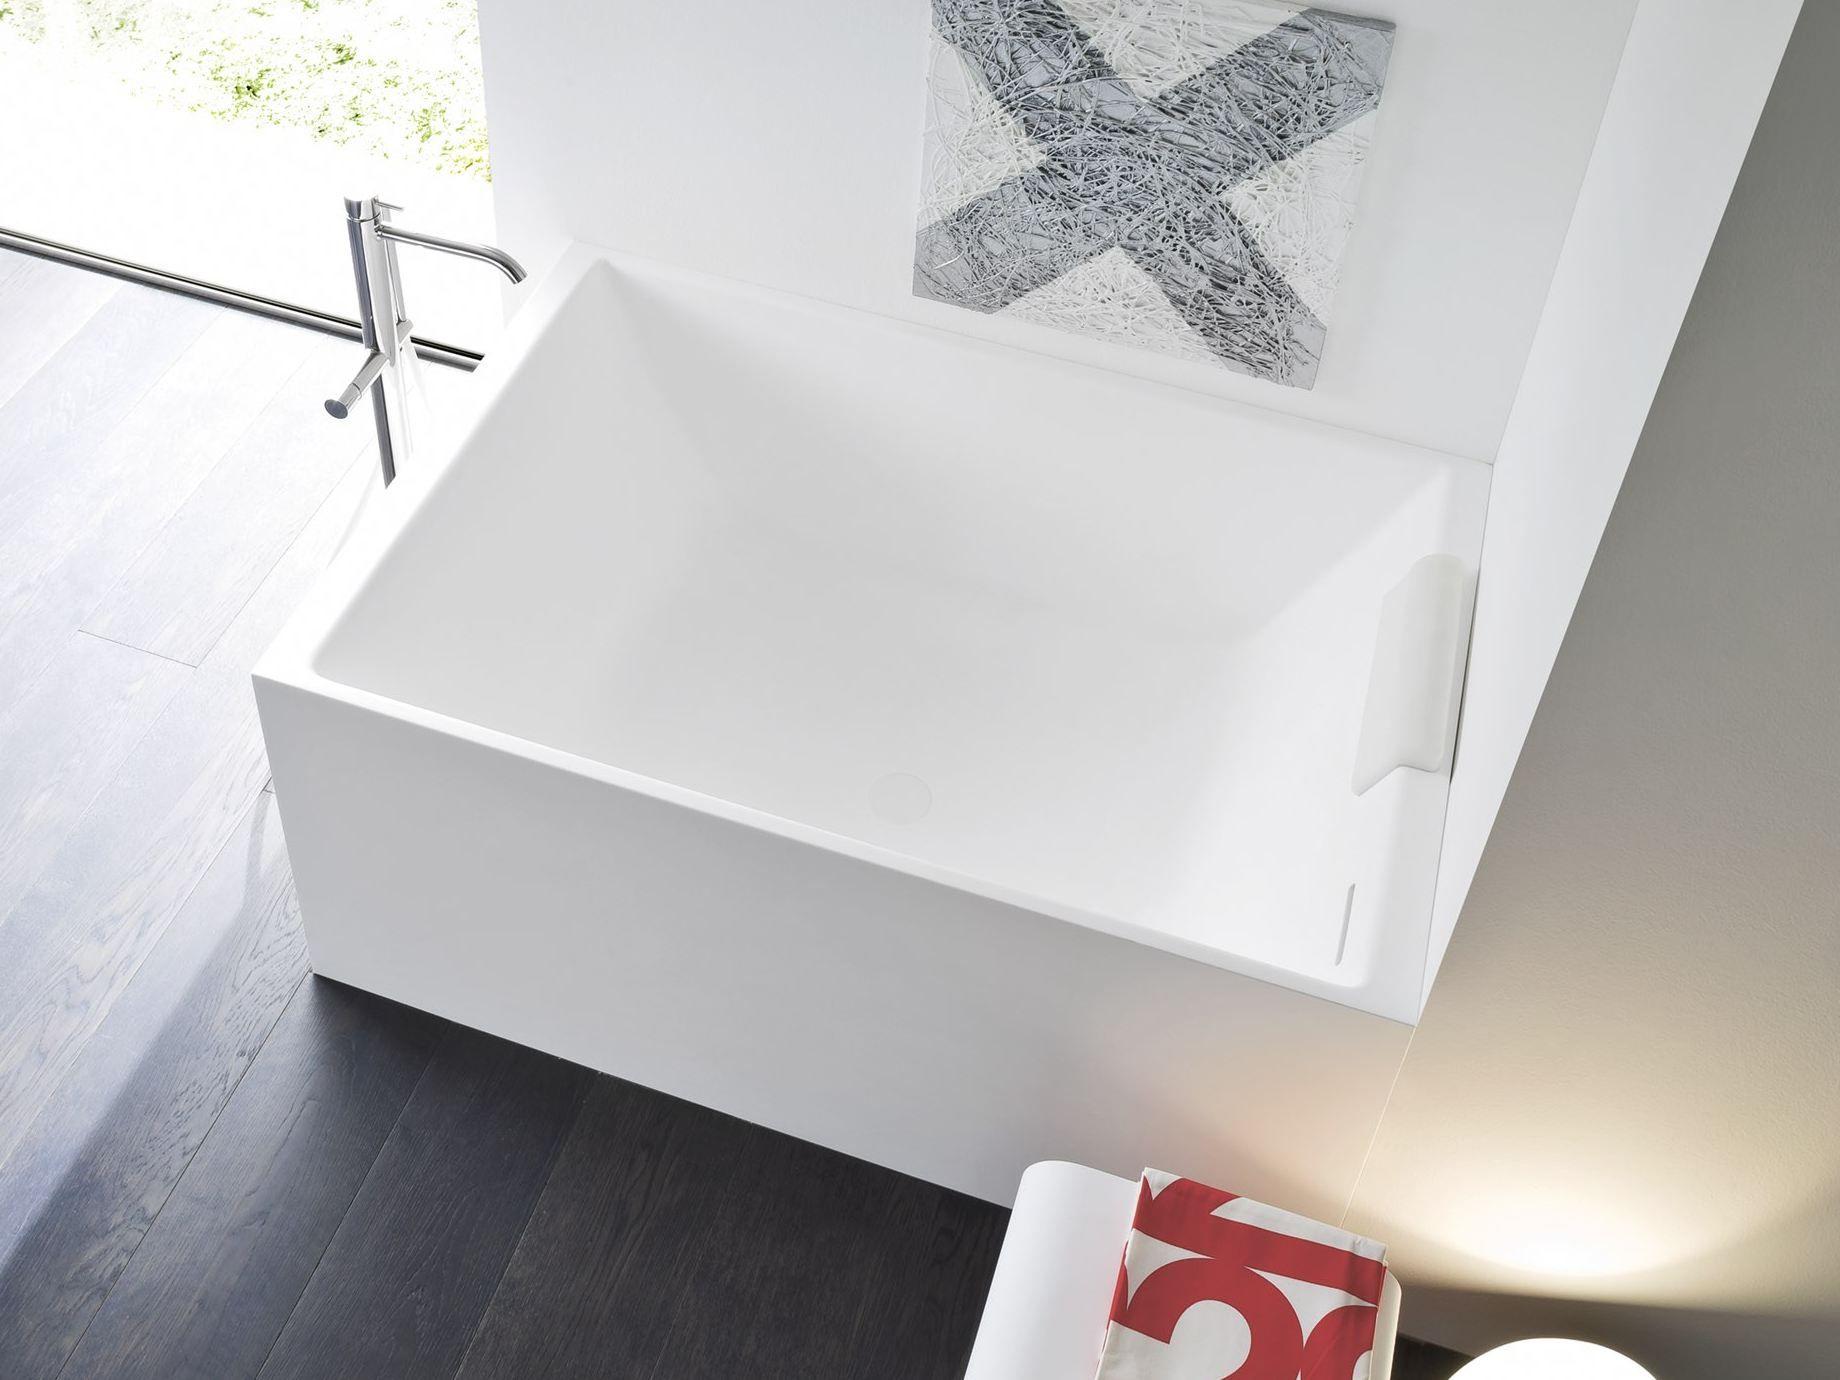 baignoire rectangulaire en korakril unico mini by rexa design design imago design. Black Bedroom Furniture Sets. Home Design Ideas